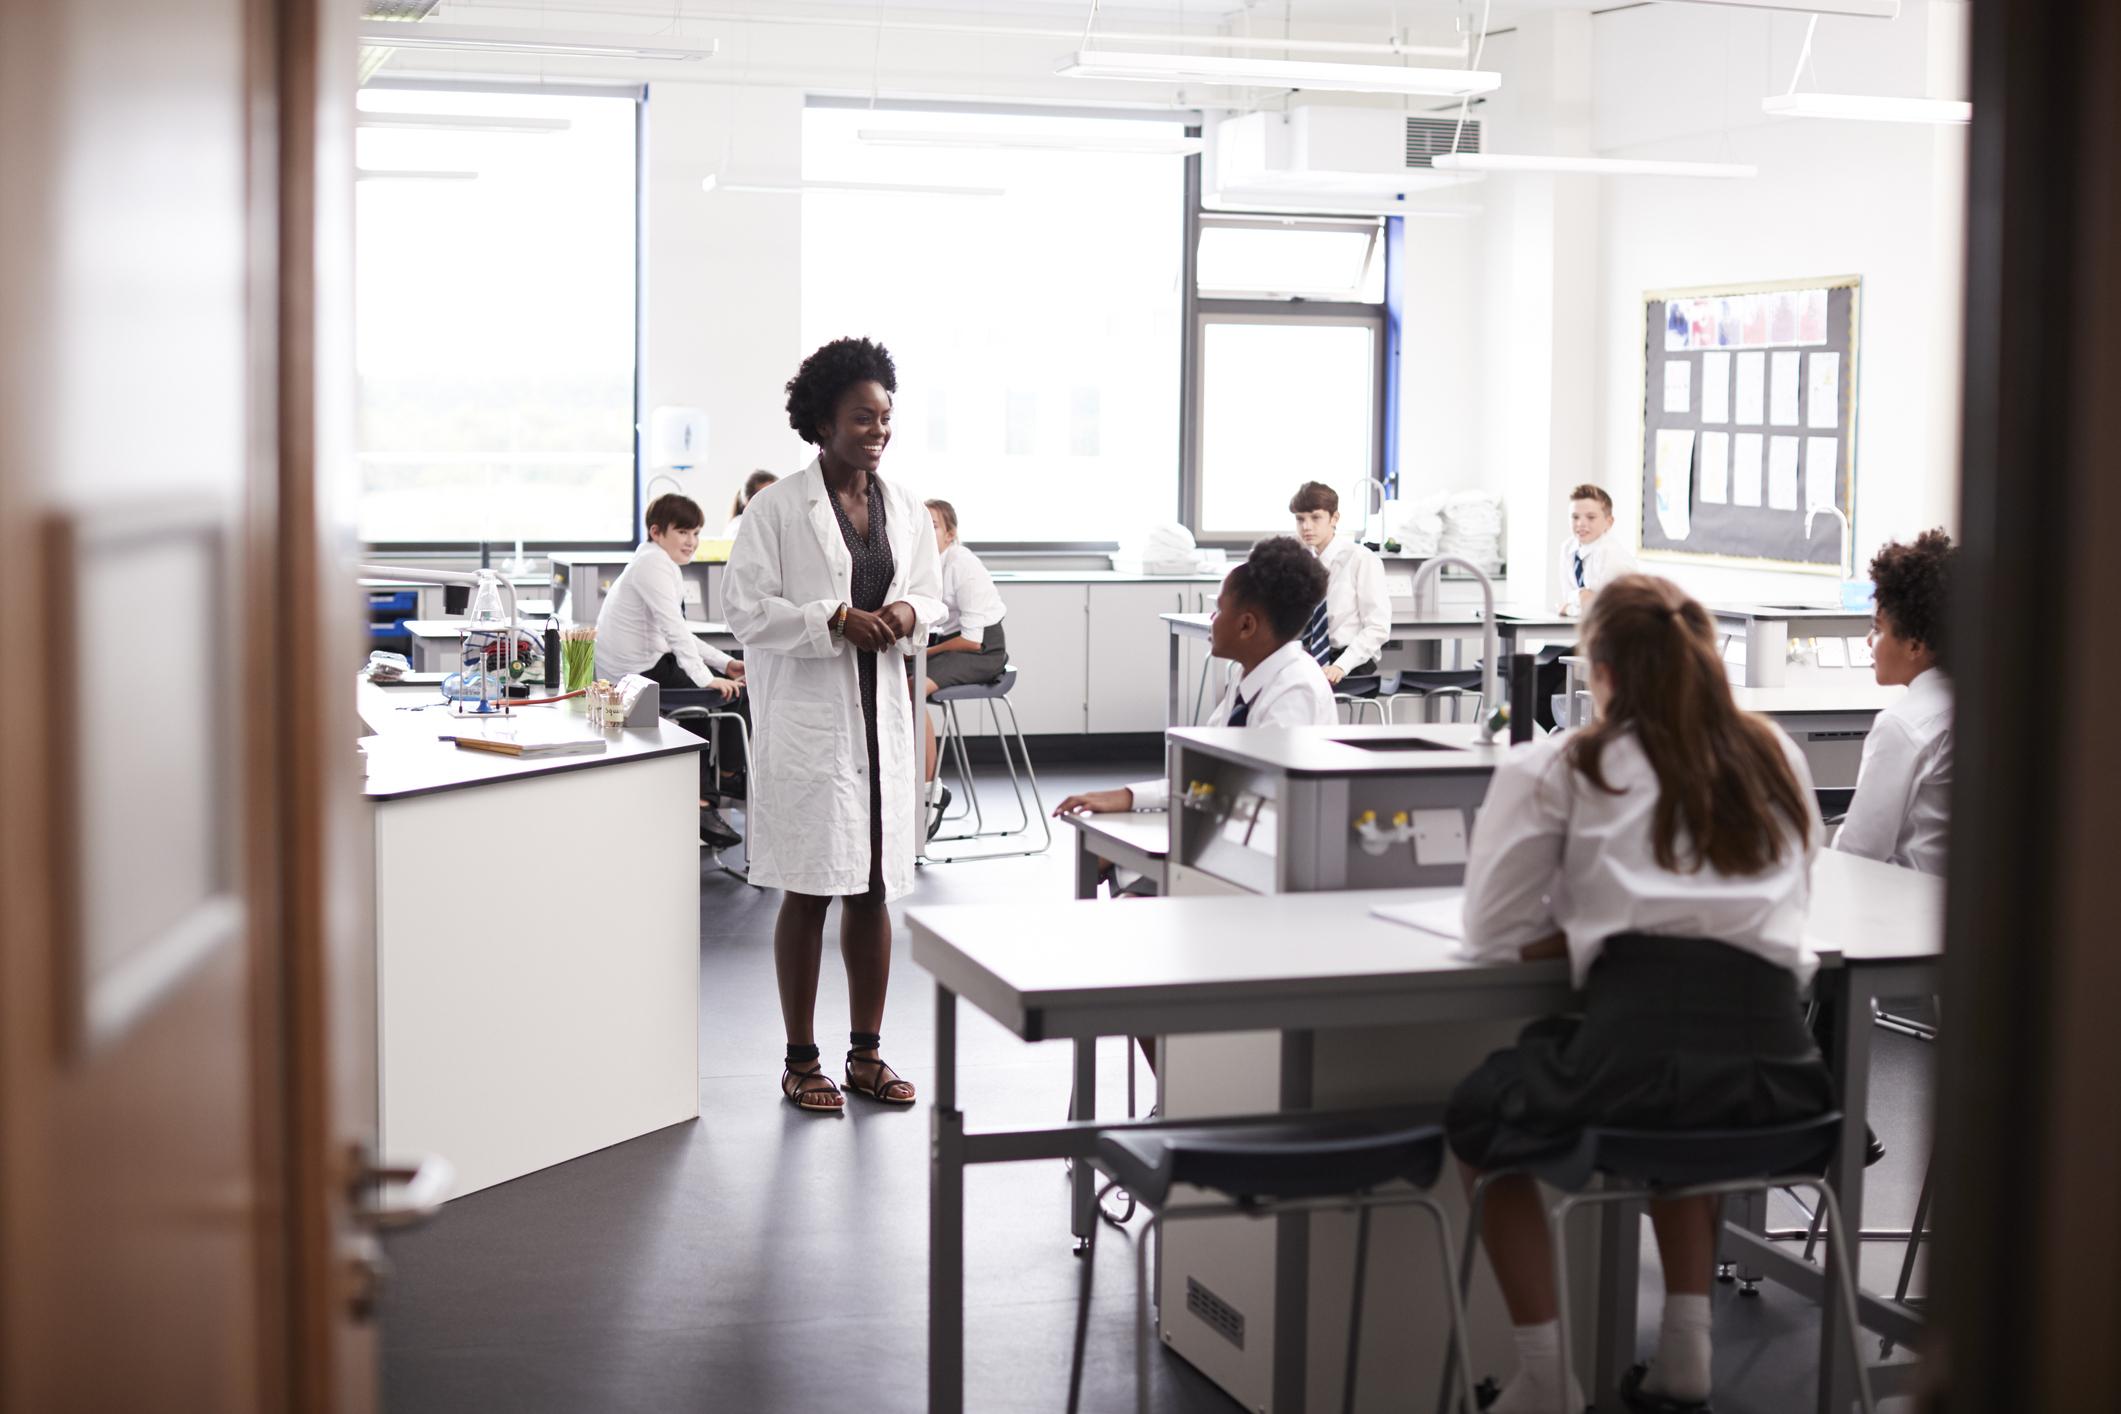 teacher wearing a lab coat teaching in a science class